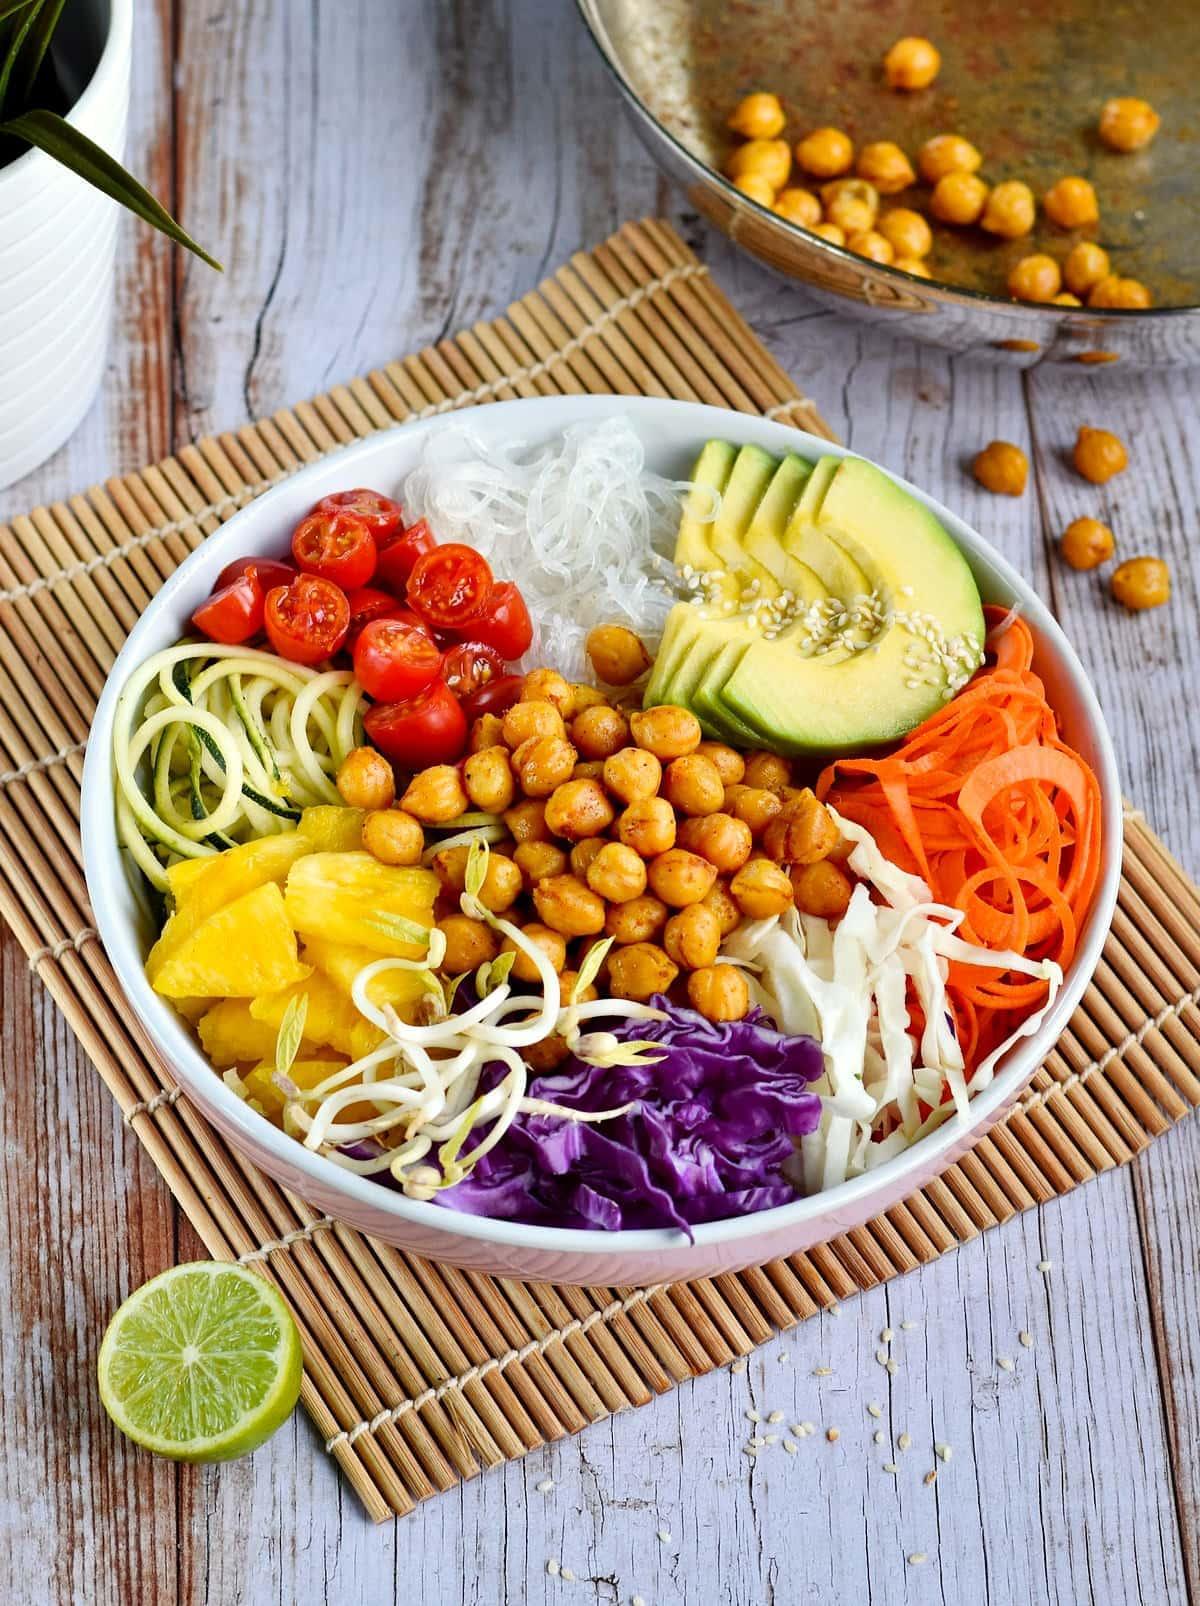 vegan buddha bowl with chickpeas avocado and colorful veggies